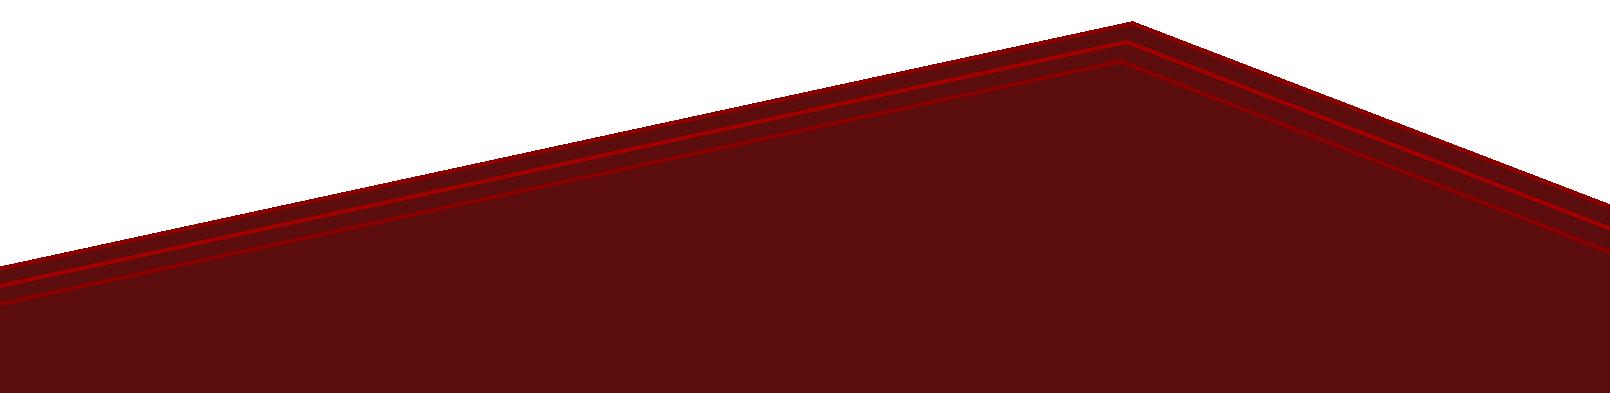 Big-League Basements Stripes